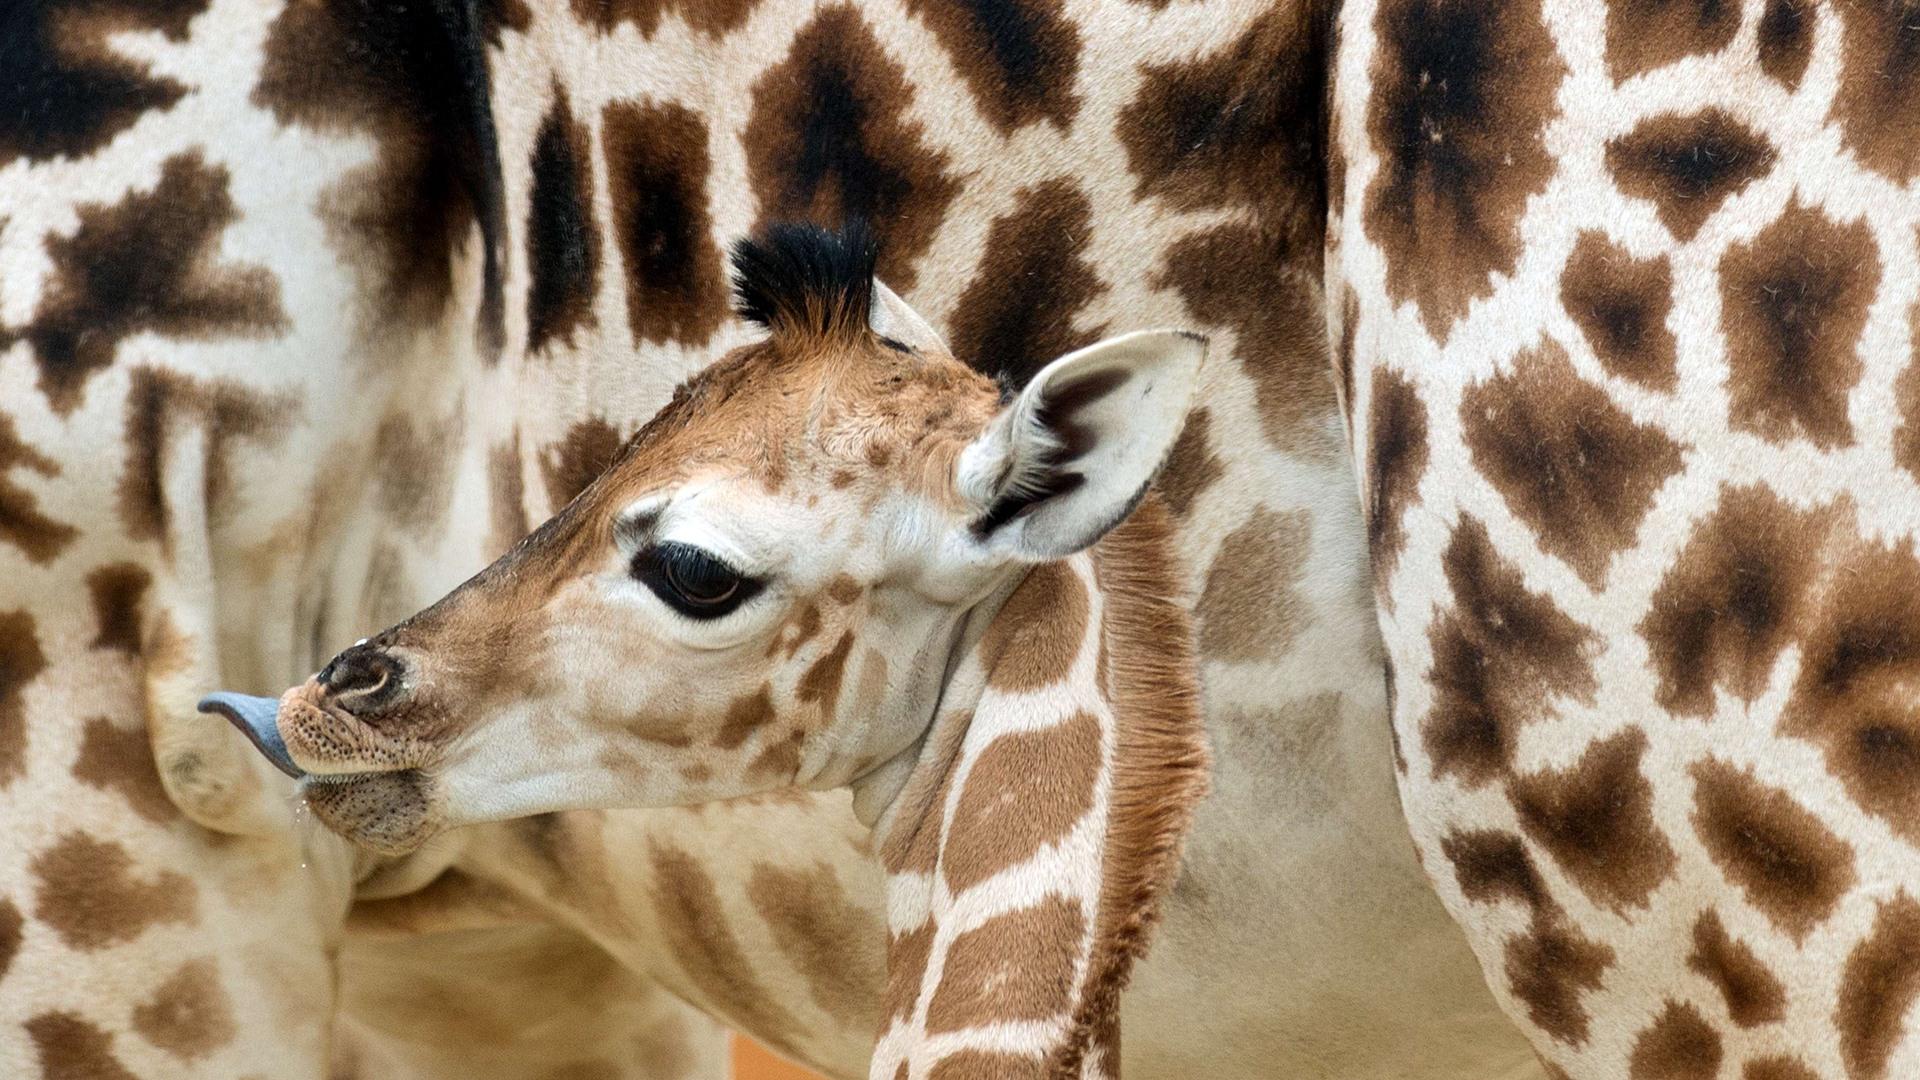 Image: GERMANY-ANIMAL-GIRAFFE